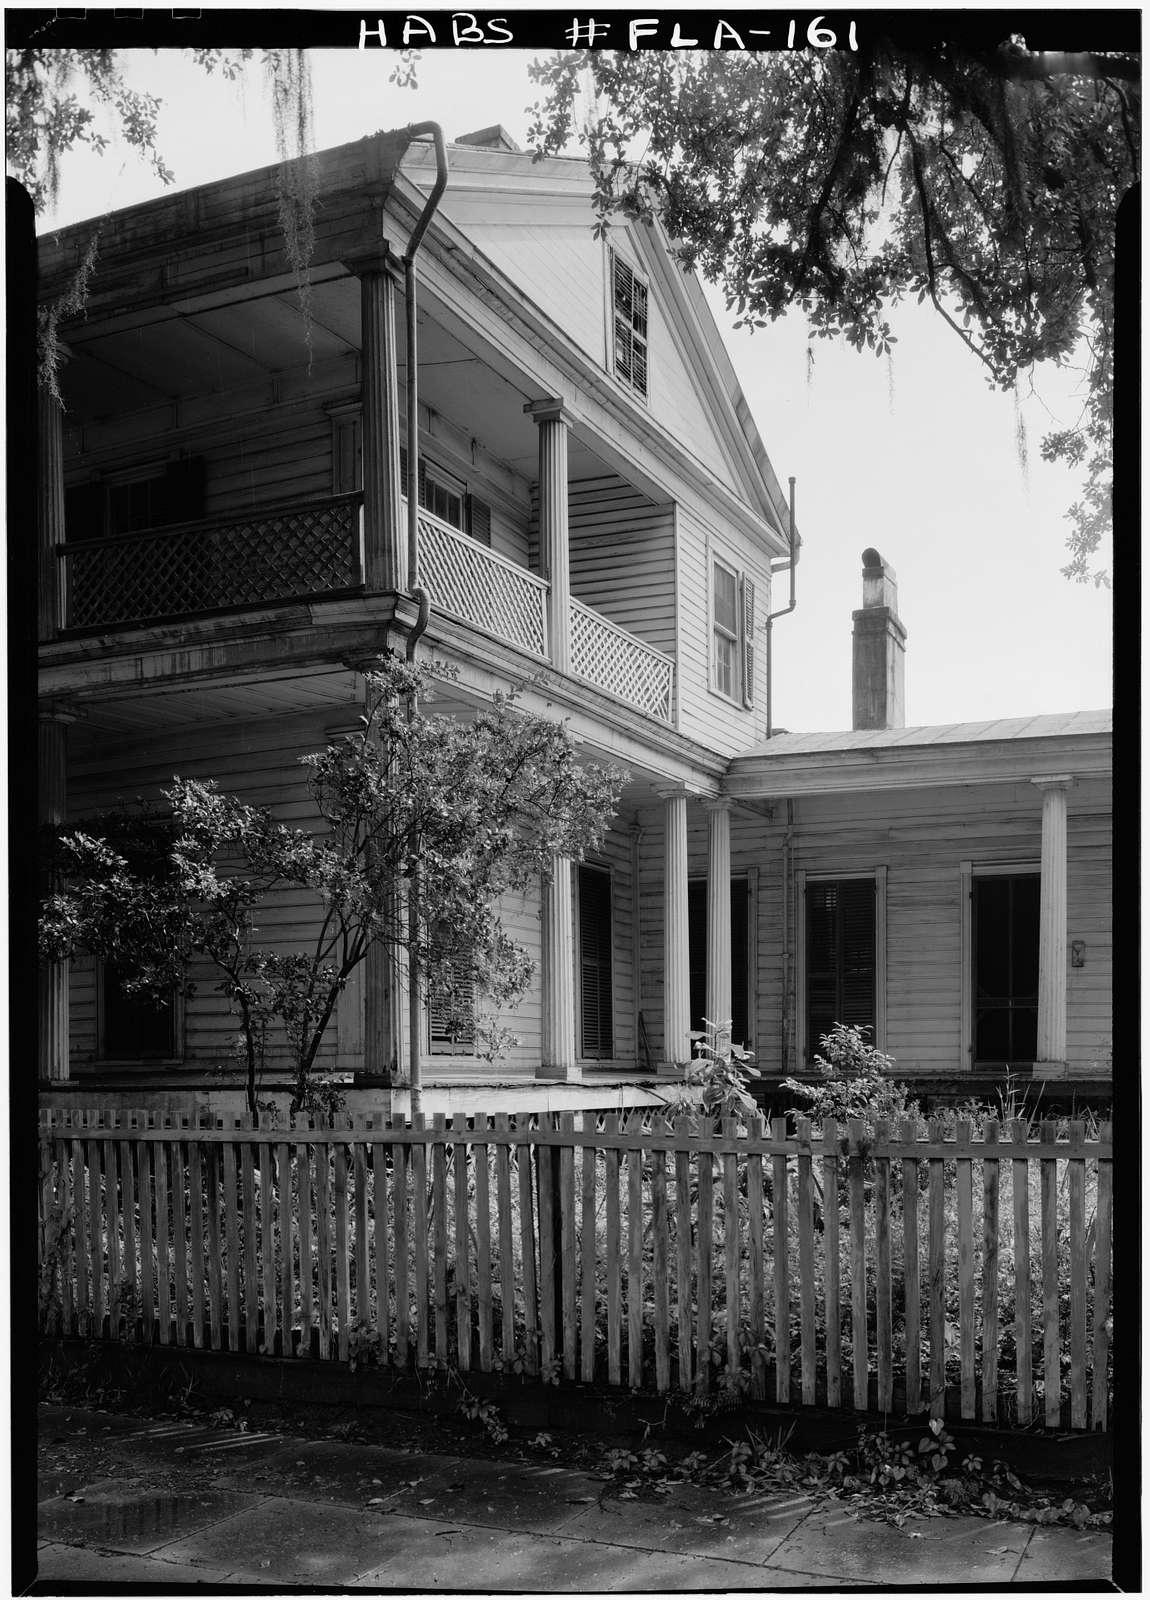 James Kirksey House, 325 North Calhoun Street, Tallahassee, Leon County, FL